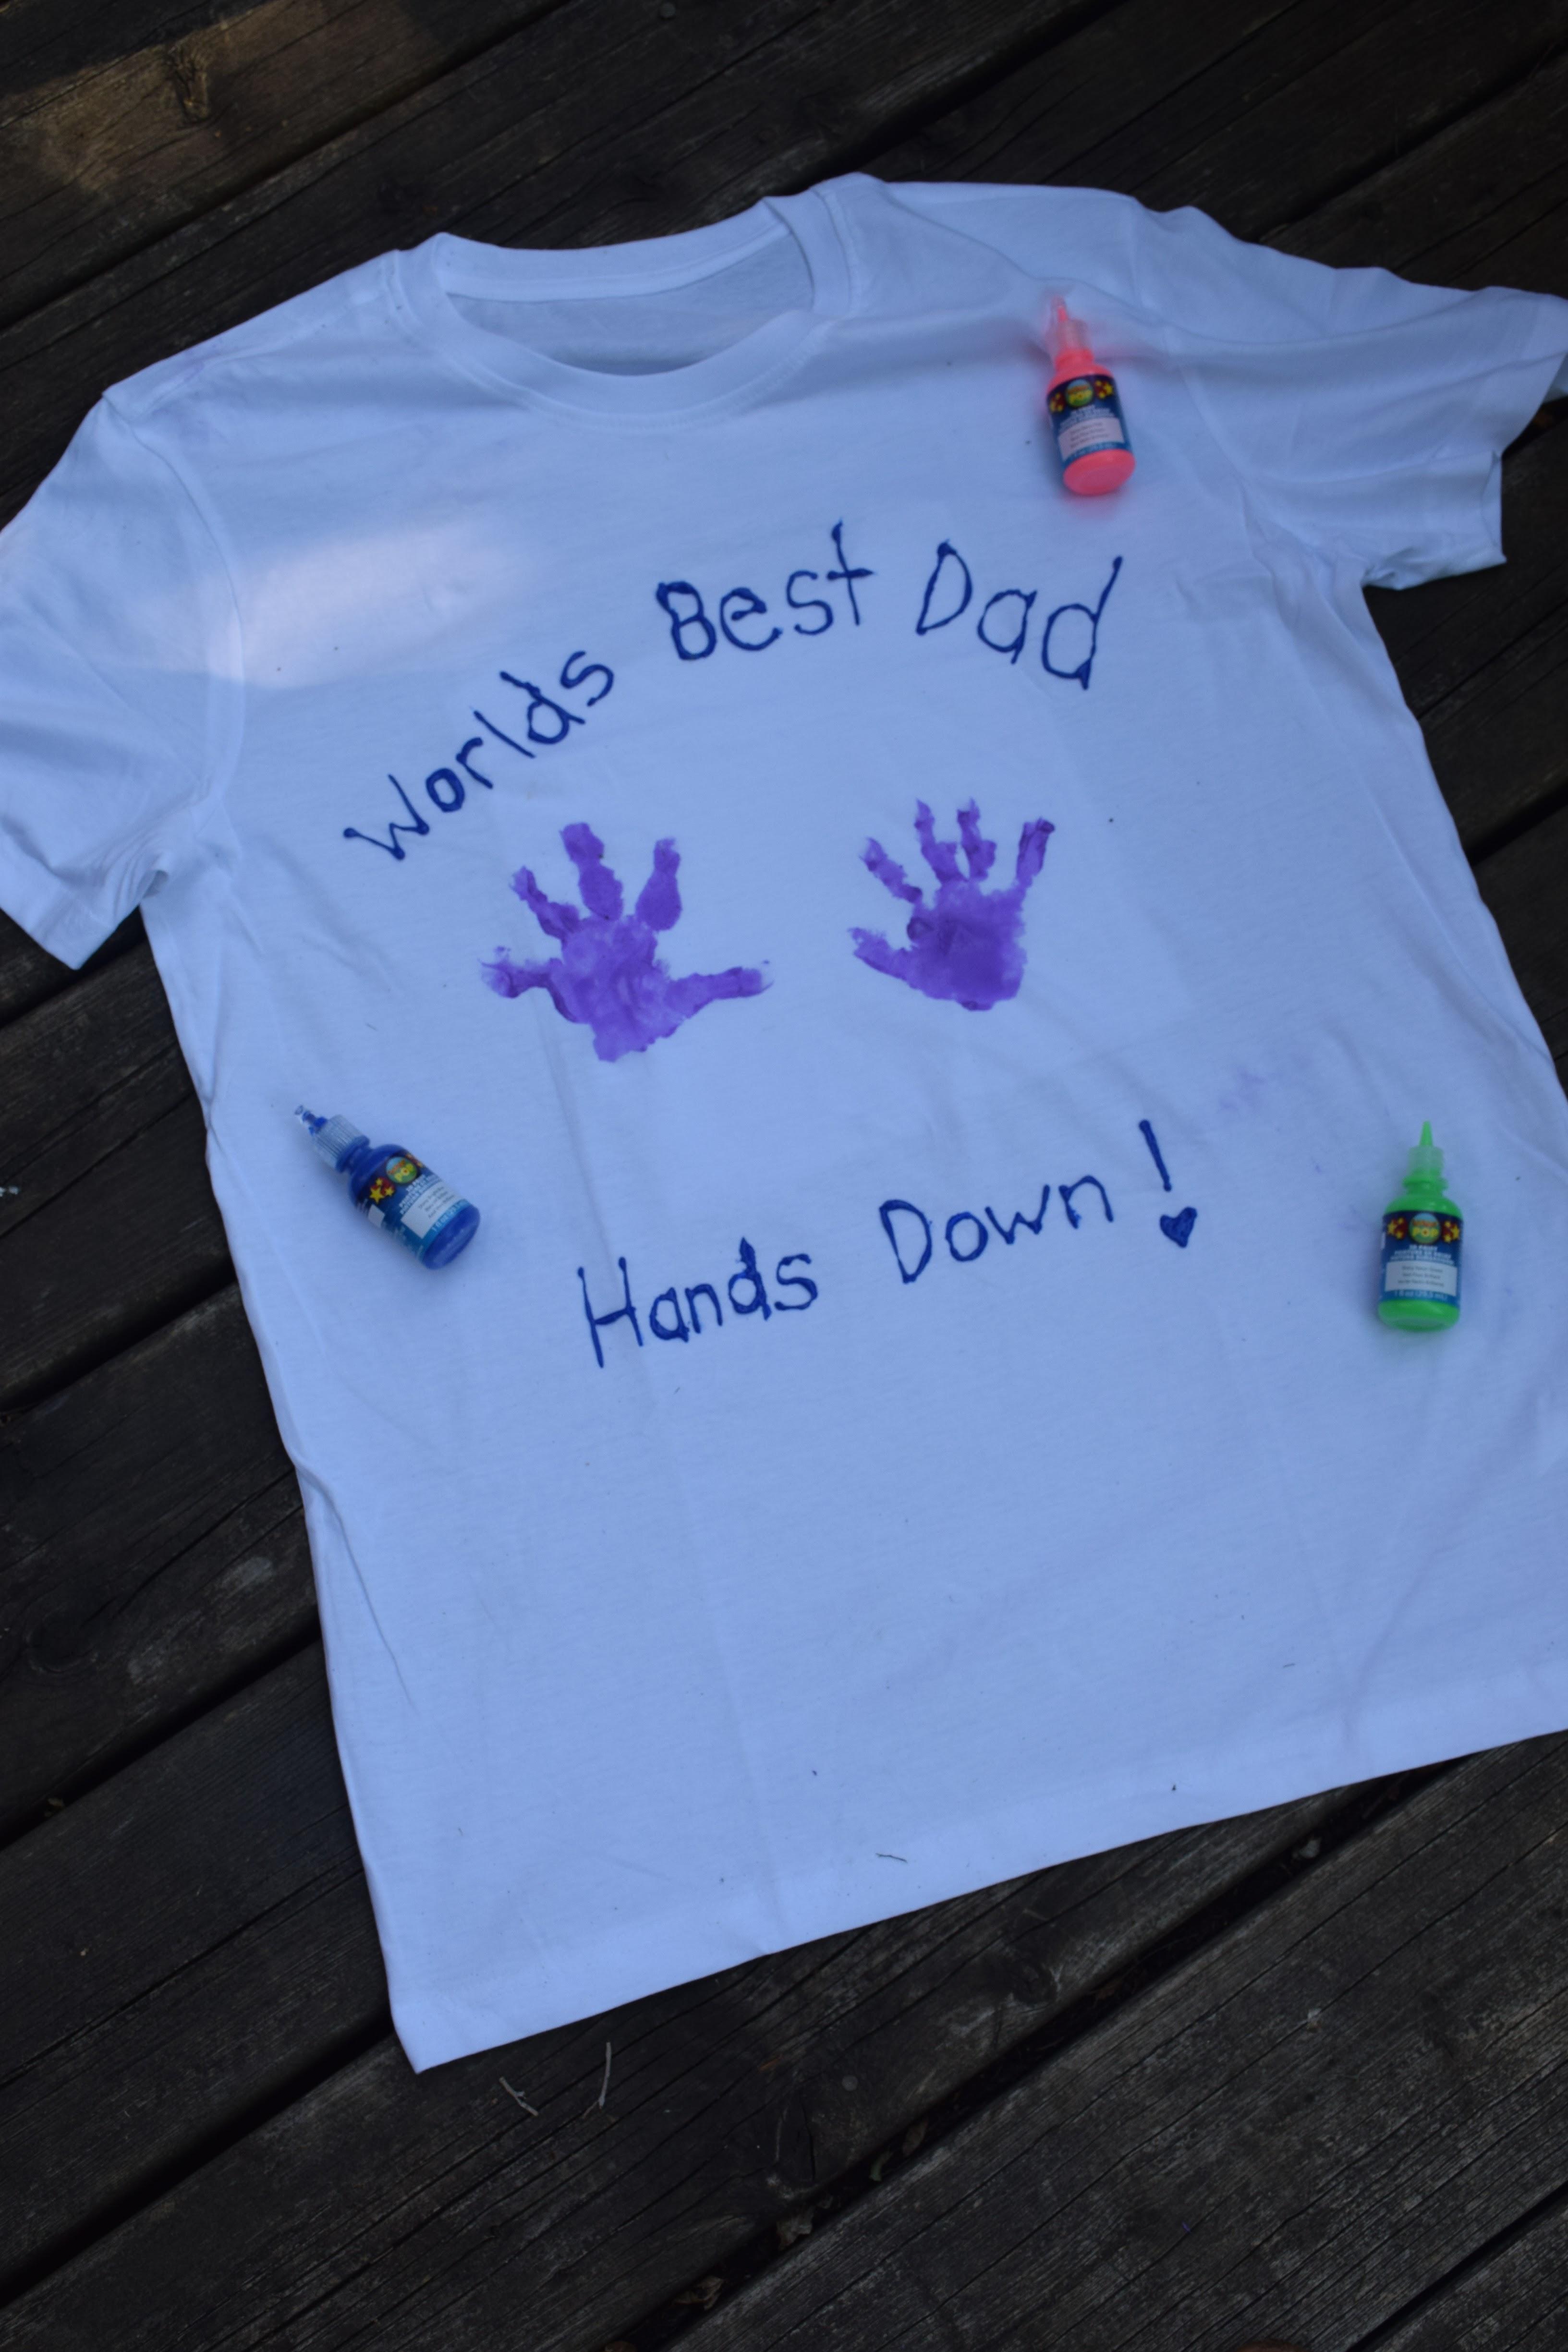 ba756b33 Diy Shirts For Dad